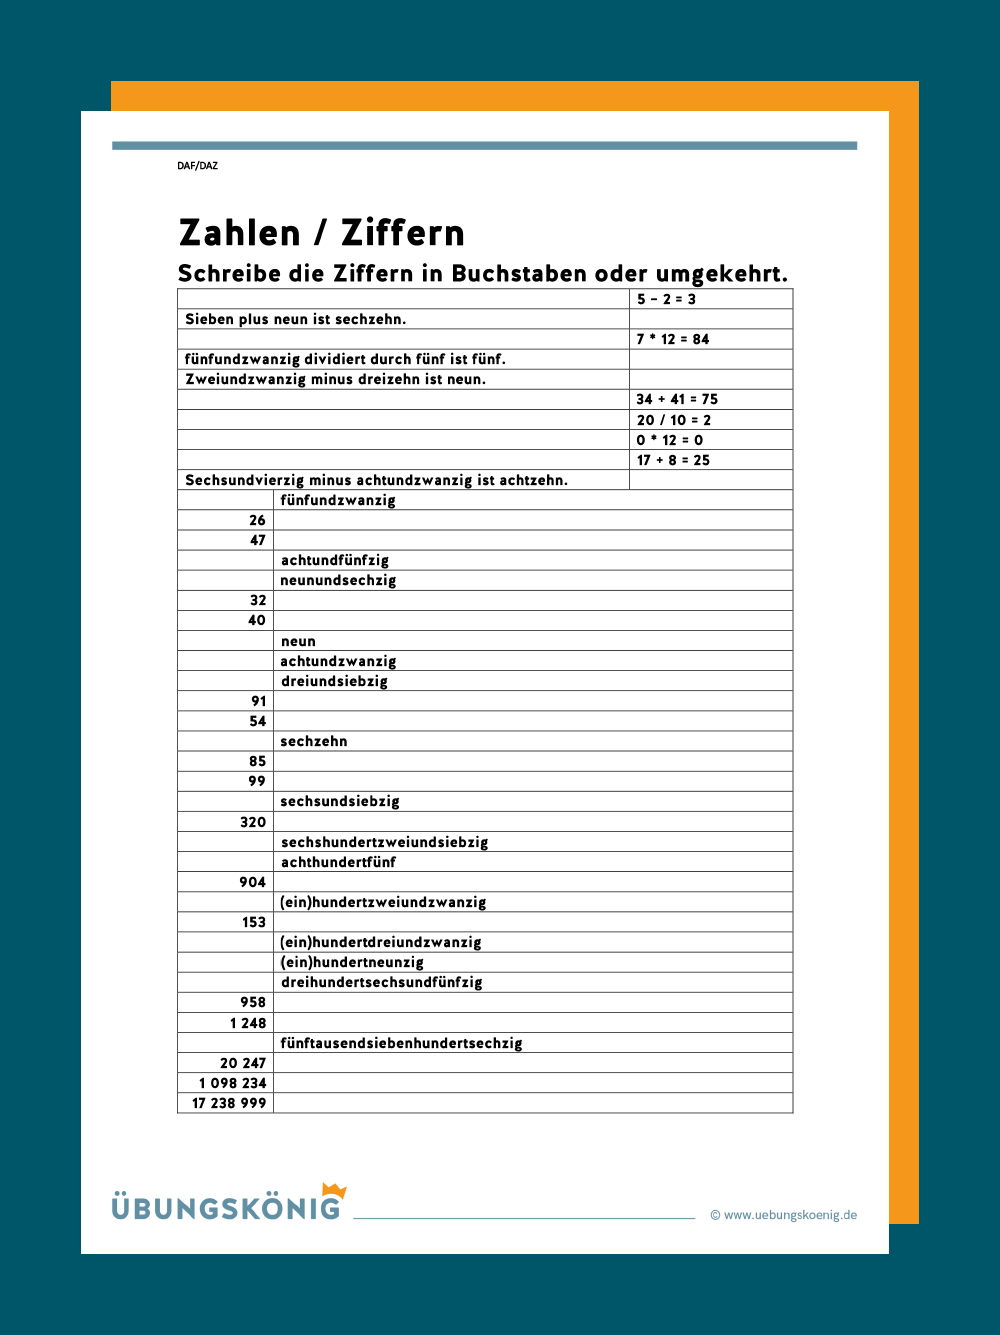 DaZ / DaF Kardinalzahlen